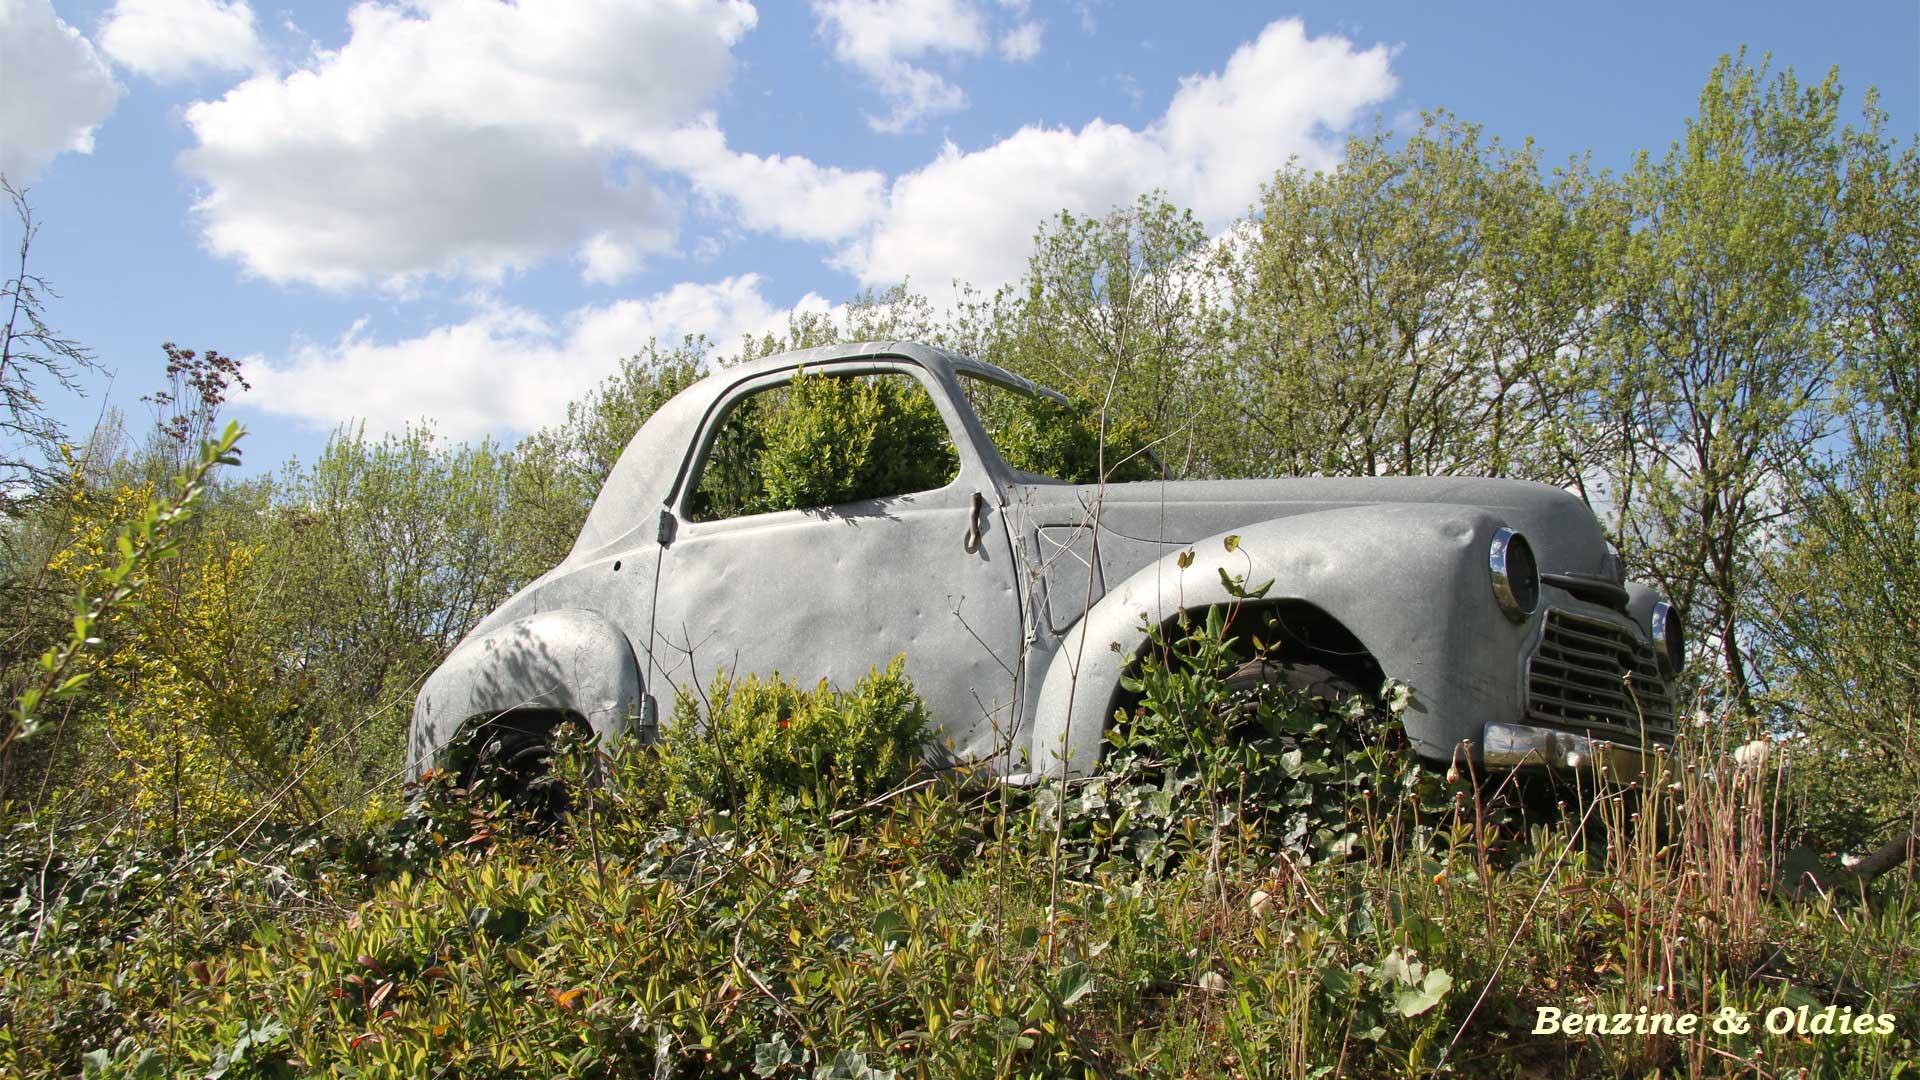 une Simca 6 carrosserie aluminium oubliée dans la nature - Simca6 948342simca6street27w19201080